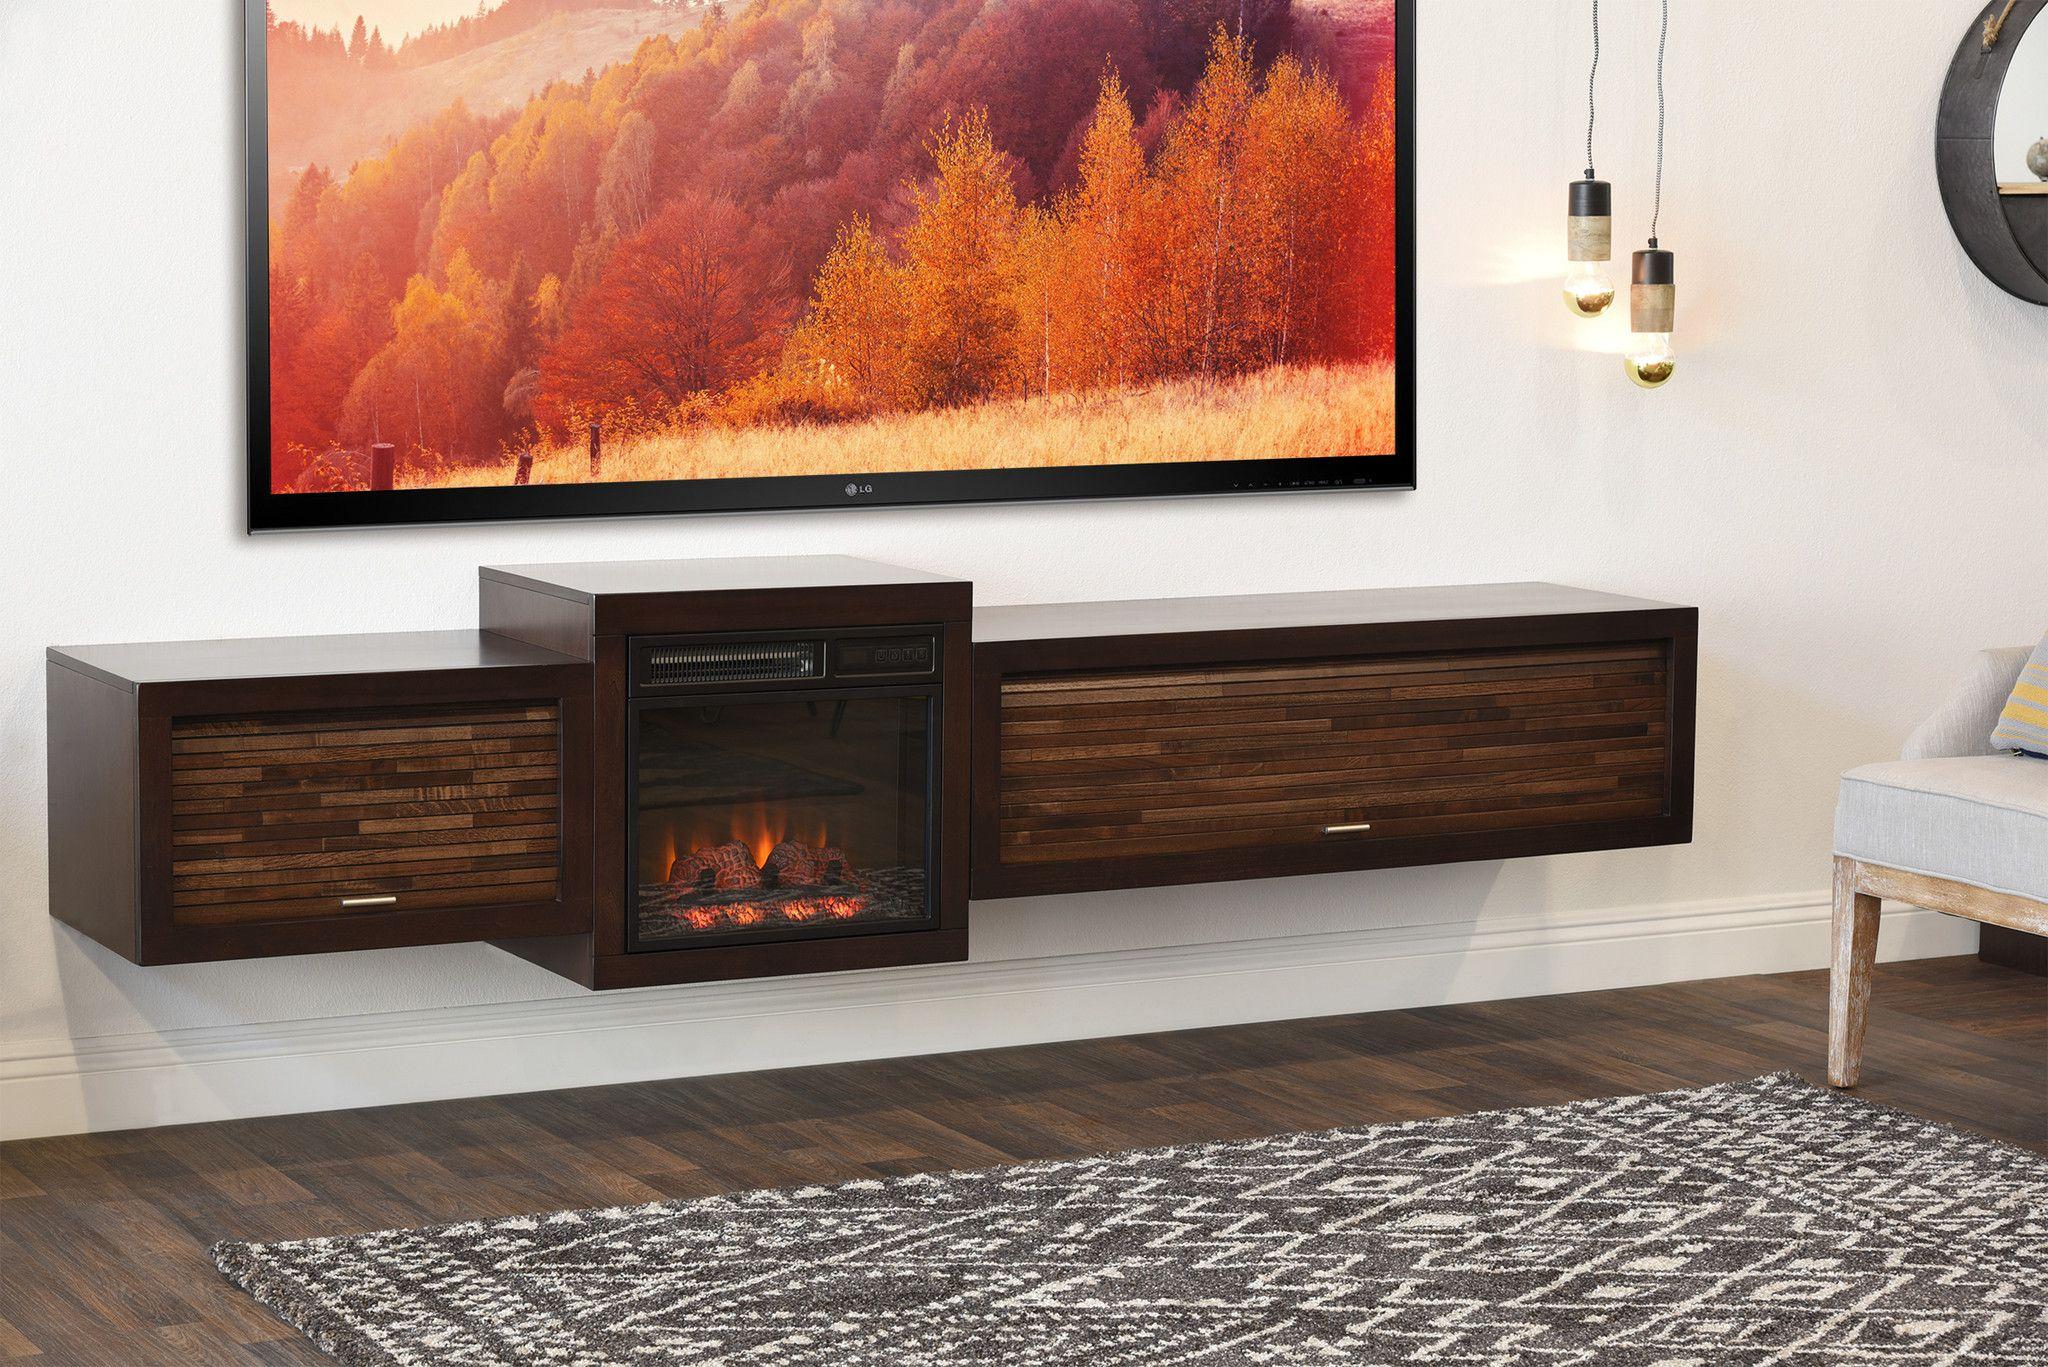 Floating Fireplace Wall Mount Tv Stand Eco Geo Espresso Wall Mount Tv Stand Floating Fireplace Wall Mount Tv Shelf